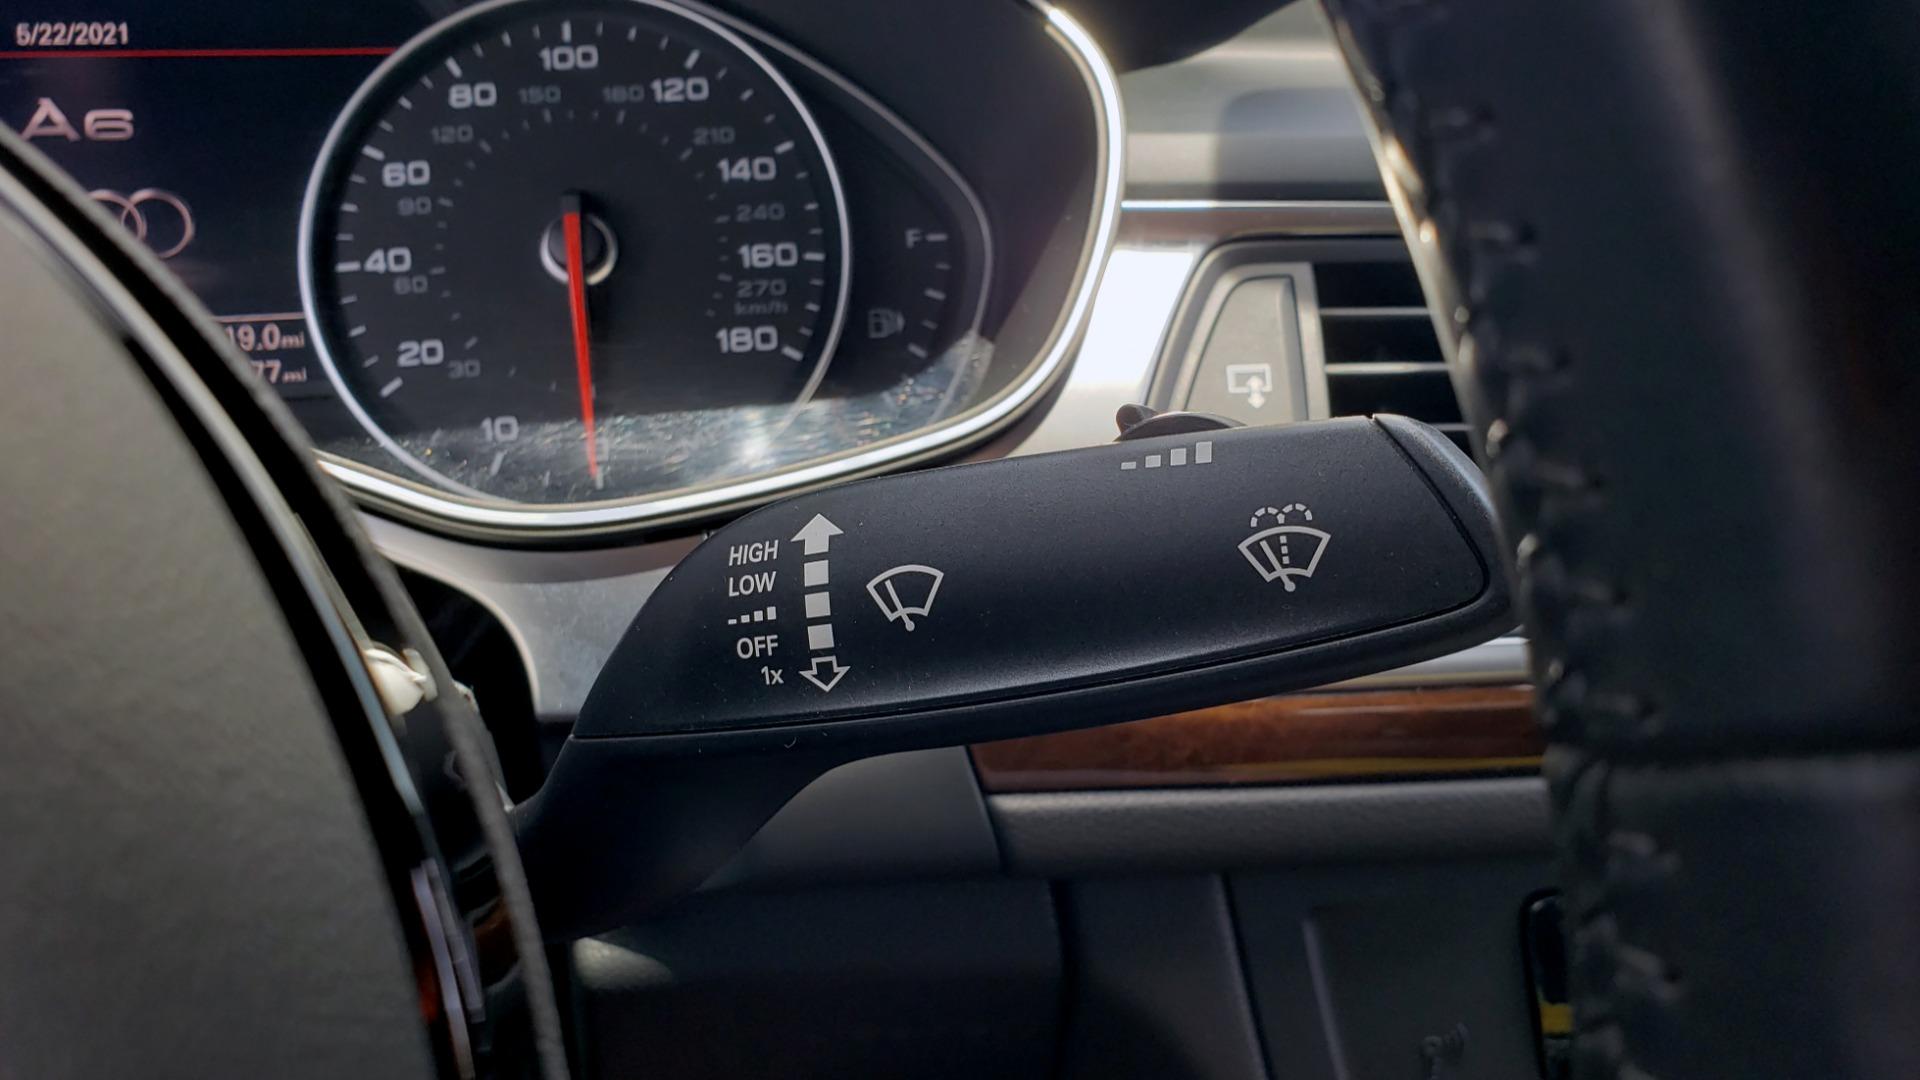 Used 2017 Audi A6 PRESTIGE SEDAN 3.0T / NAV / SUNROOF / BLACK OPTIC / CLD WTHR / REARVIEW for sale $30,797 at Formula Imports in Charlotte NC 28227 43